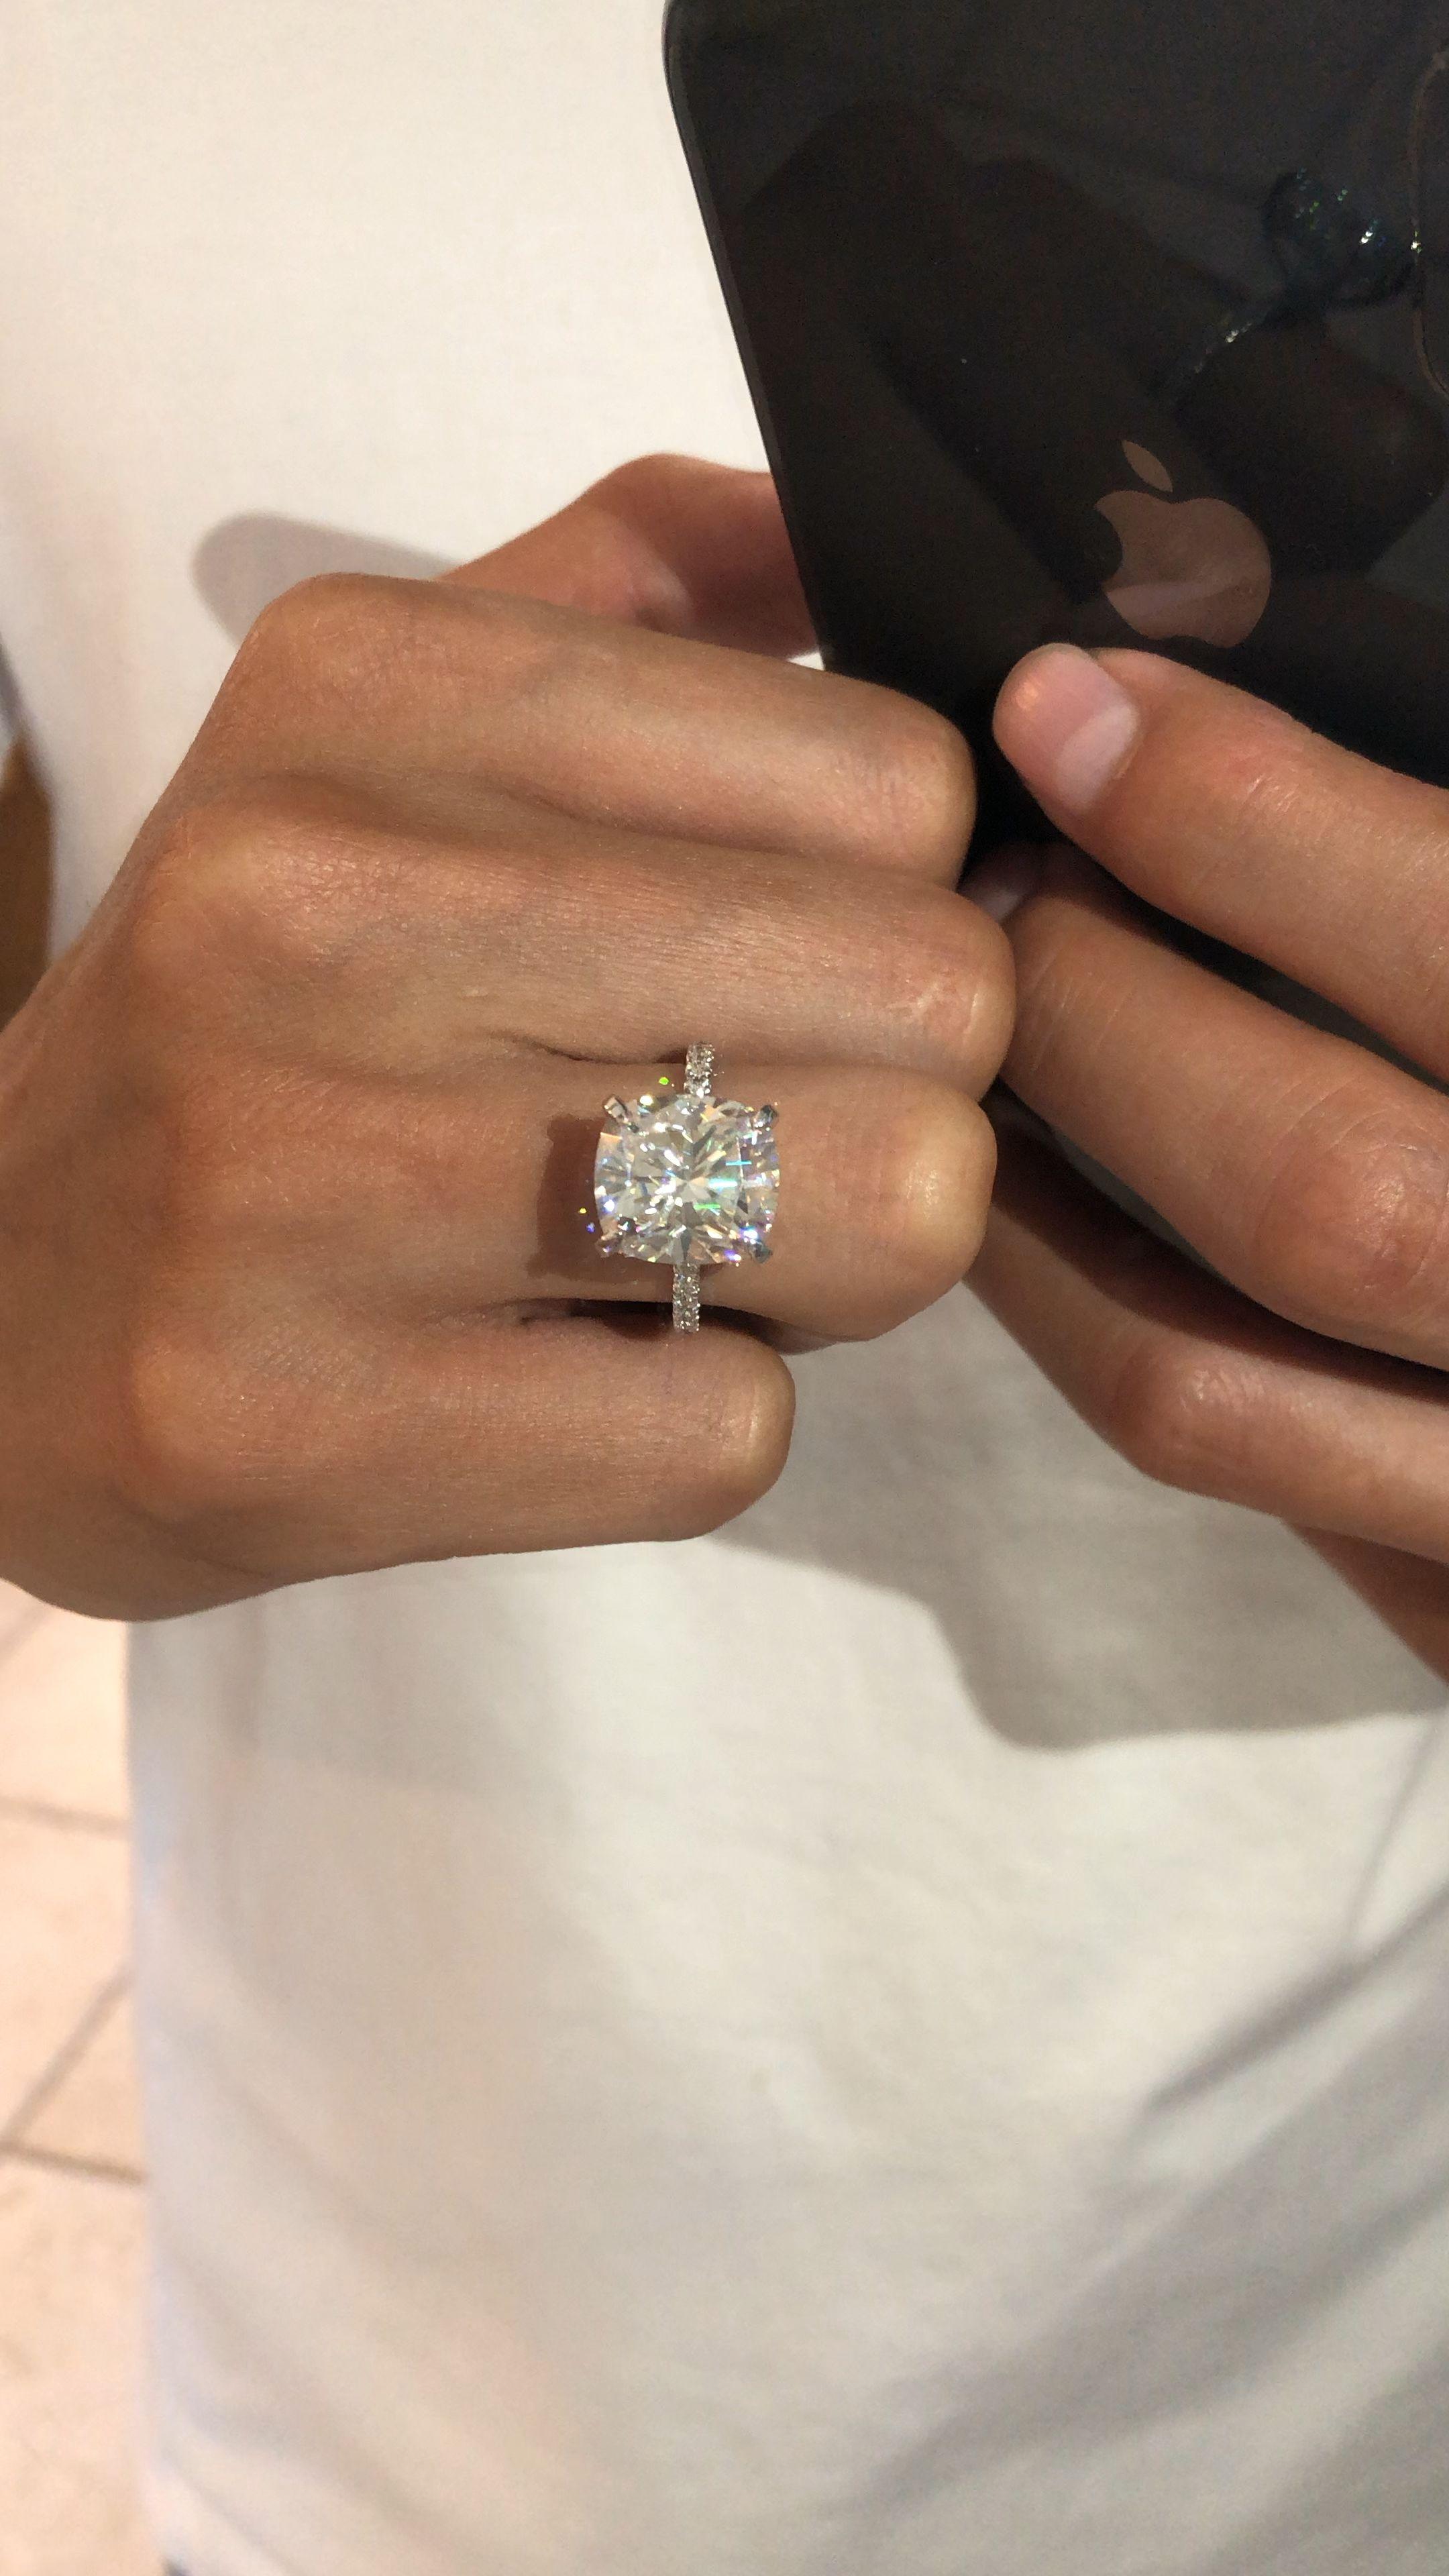 7 Carat Elongated Cushion Moissanite & Diamond Hidden Halo Engagement Ring #cushionengagementring